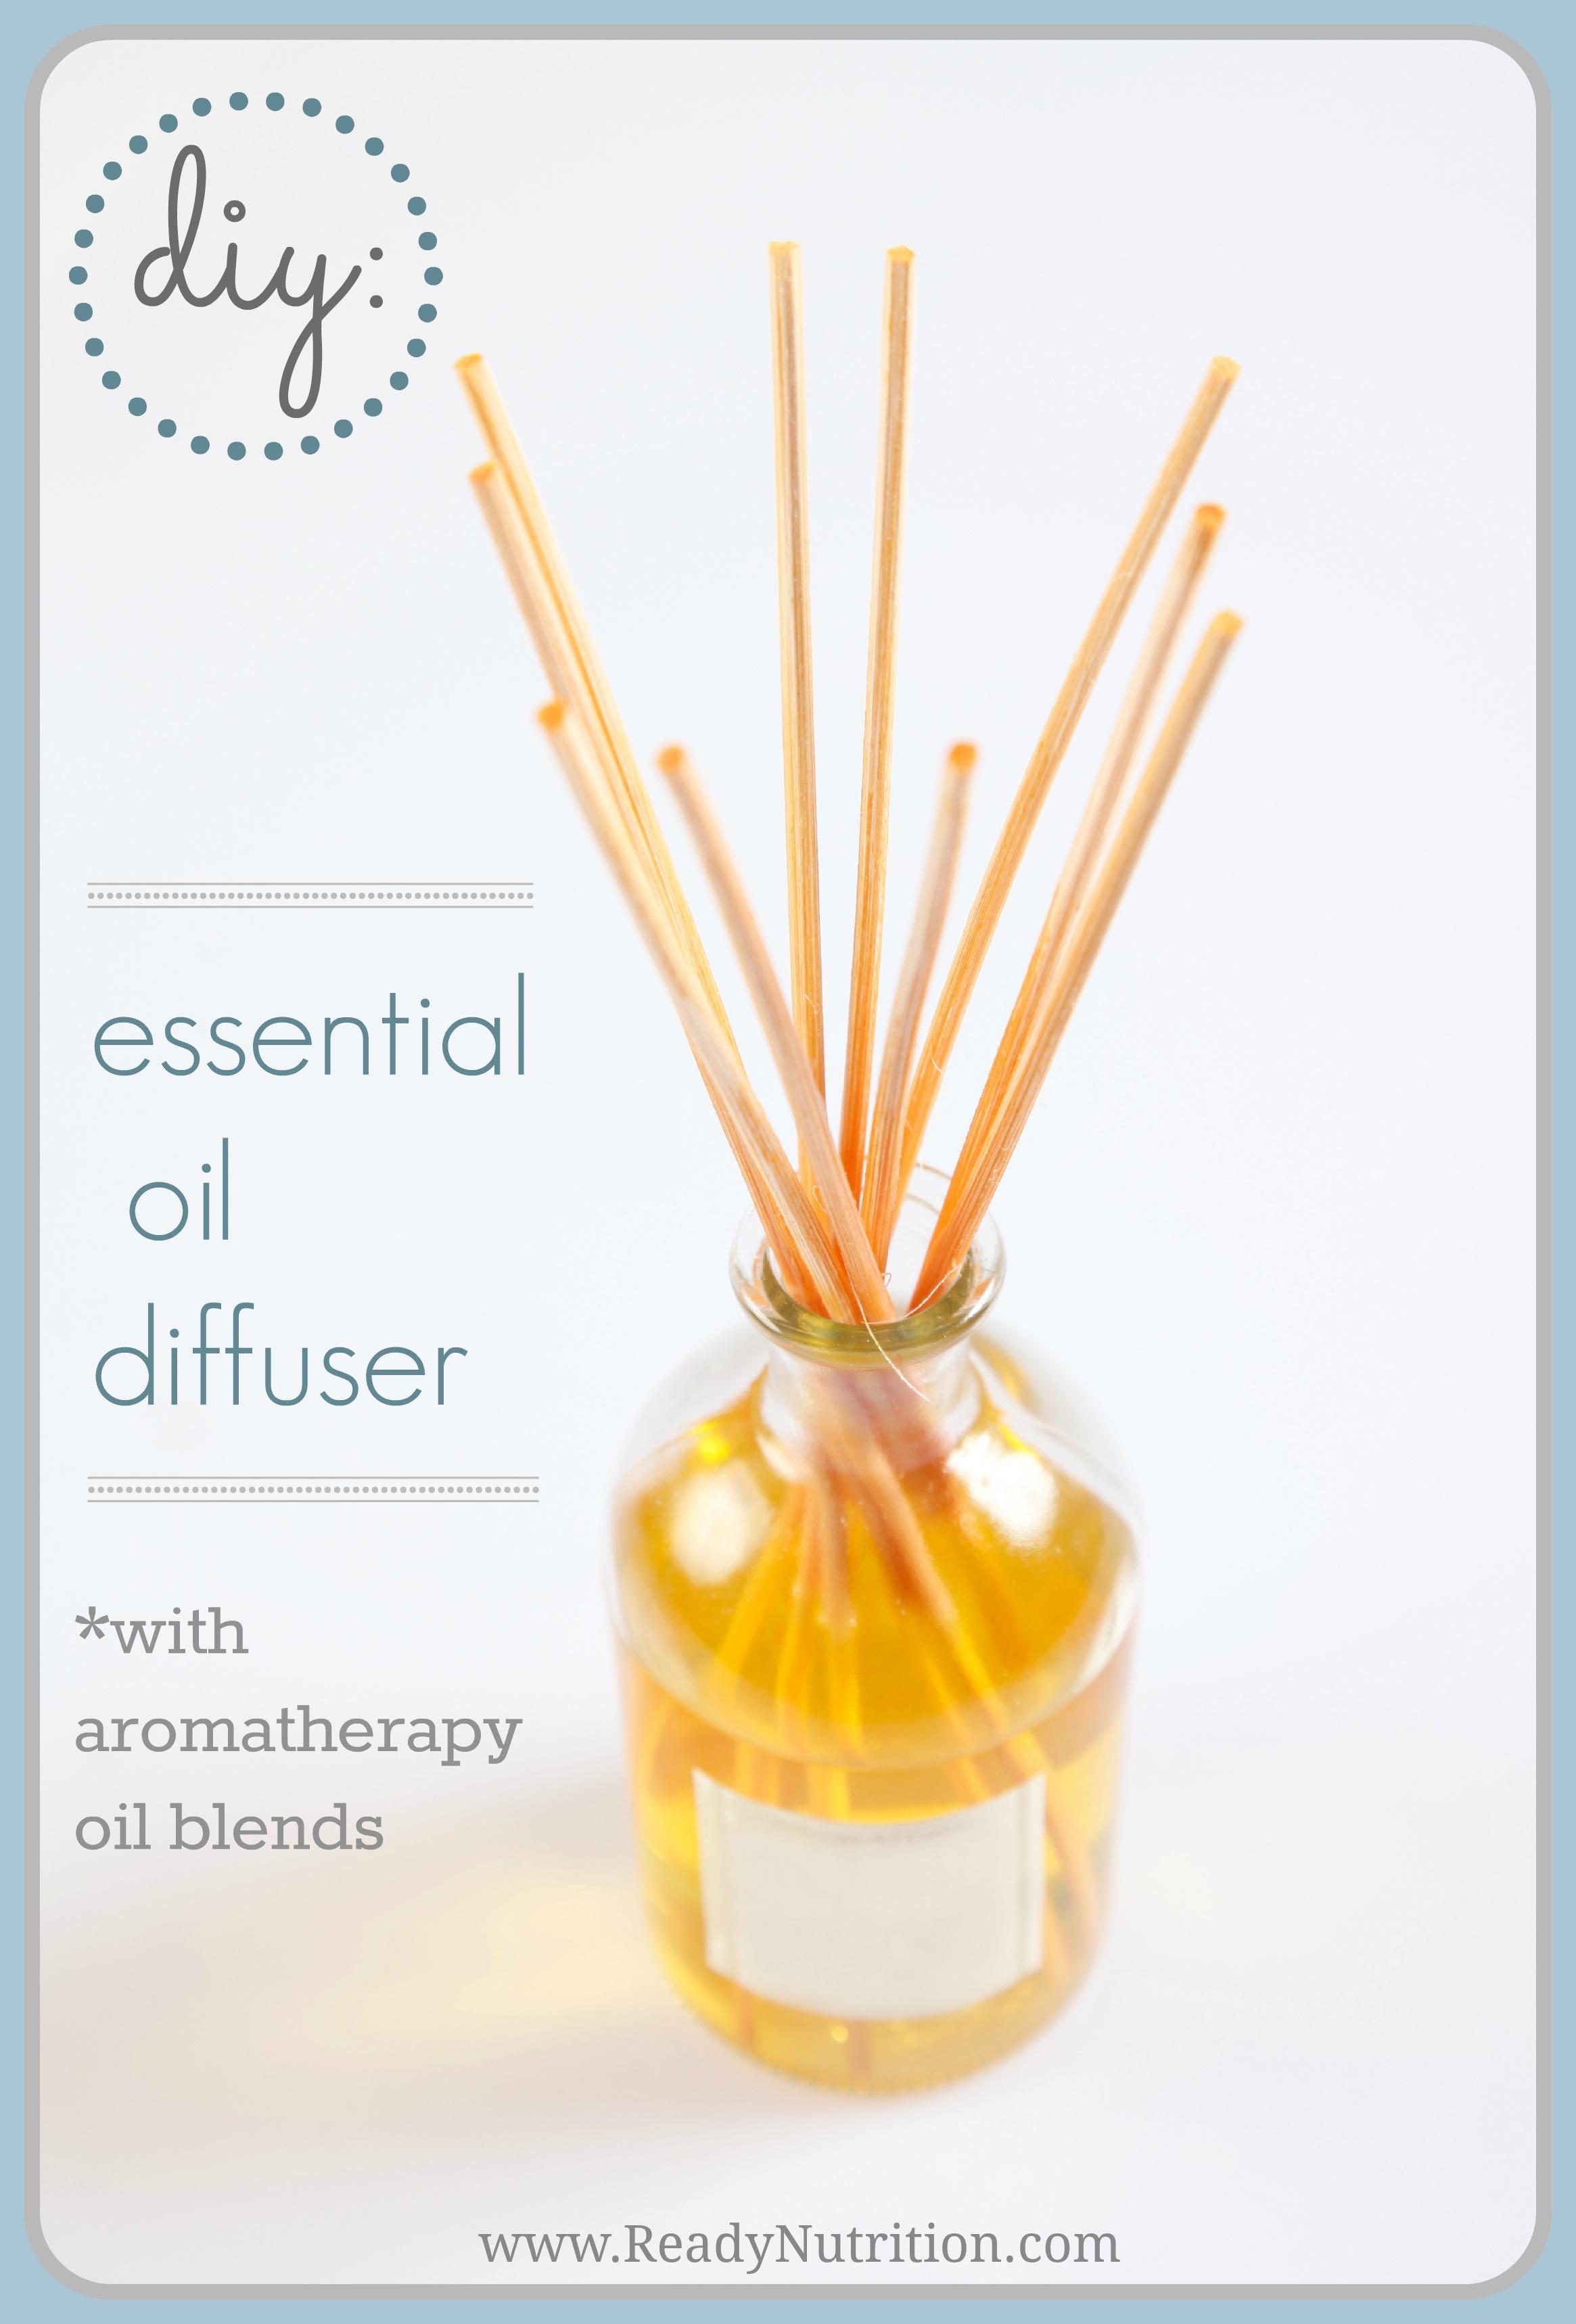 Diffuser And Oils Part - 32: Diffuser1